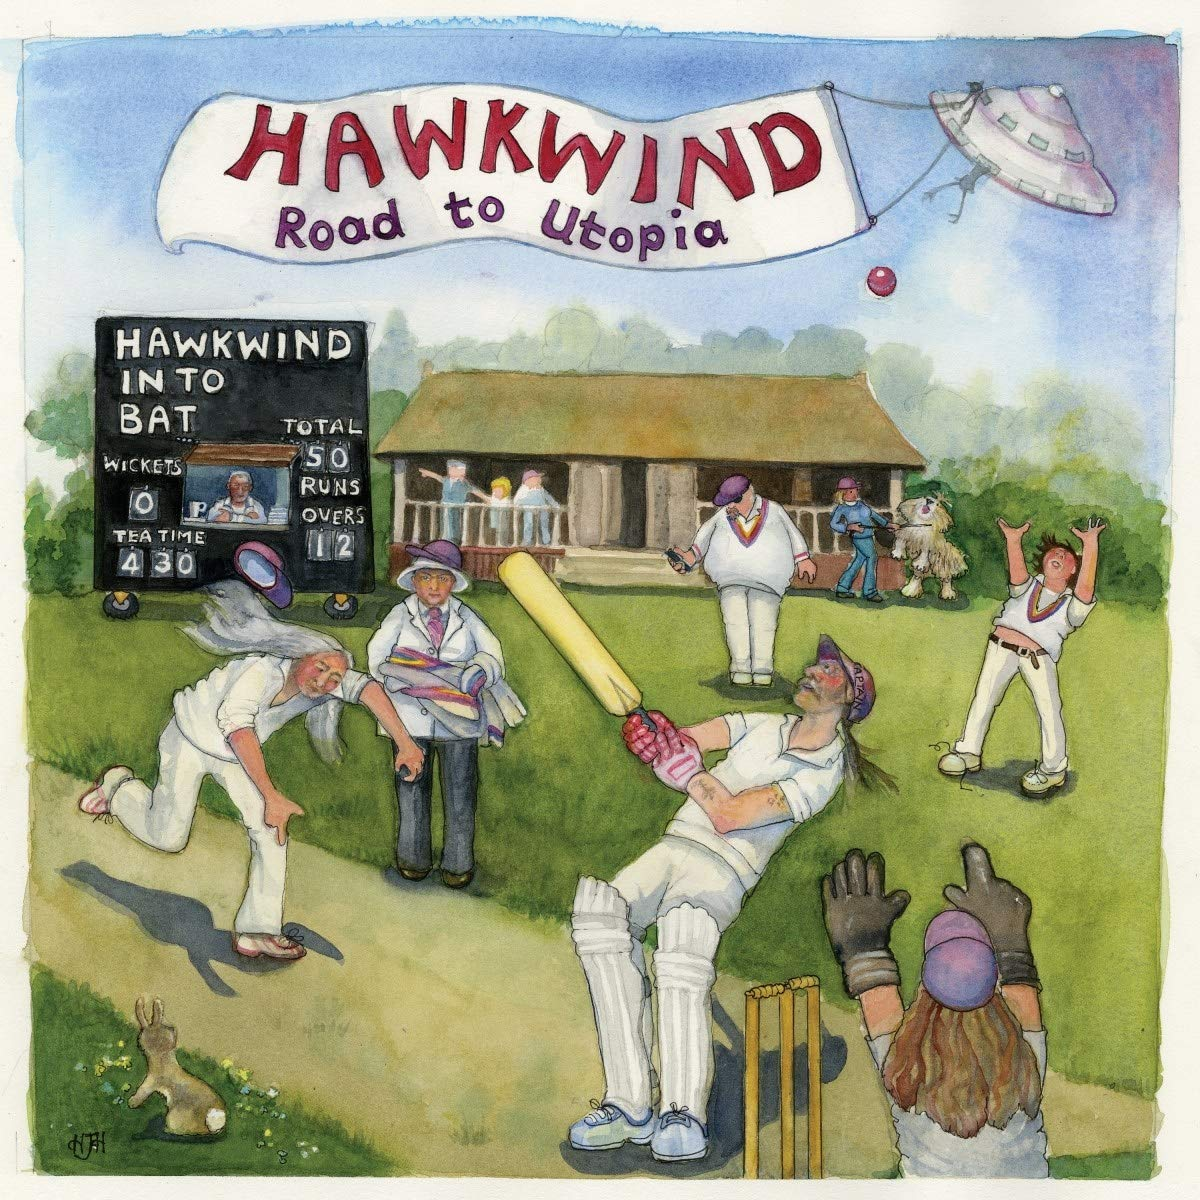 Vinilo : Hawkwind - Road To Utopia (Gatefold LP Jacket, Limited Edition)